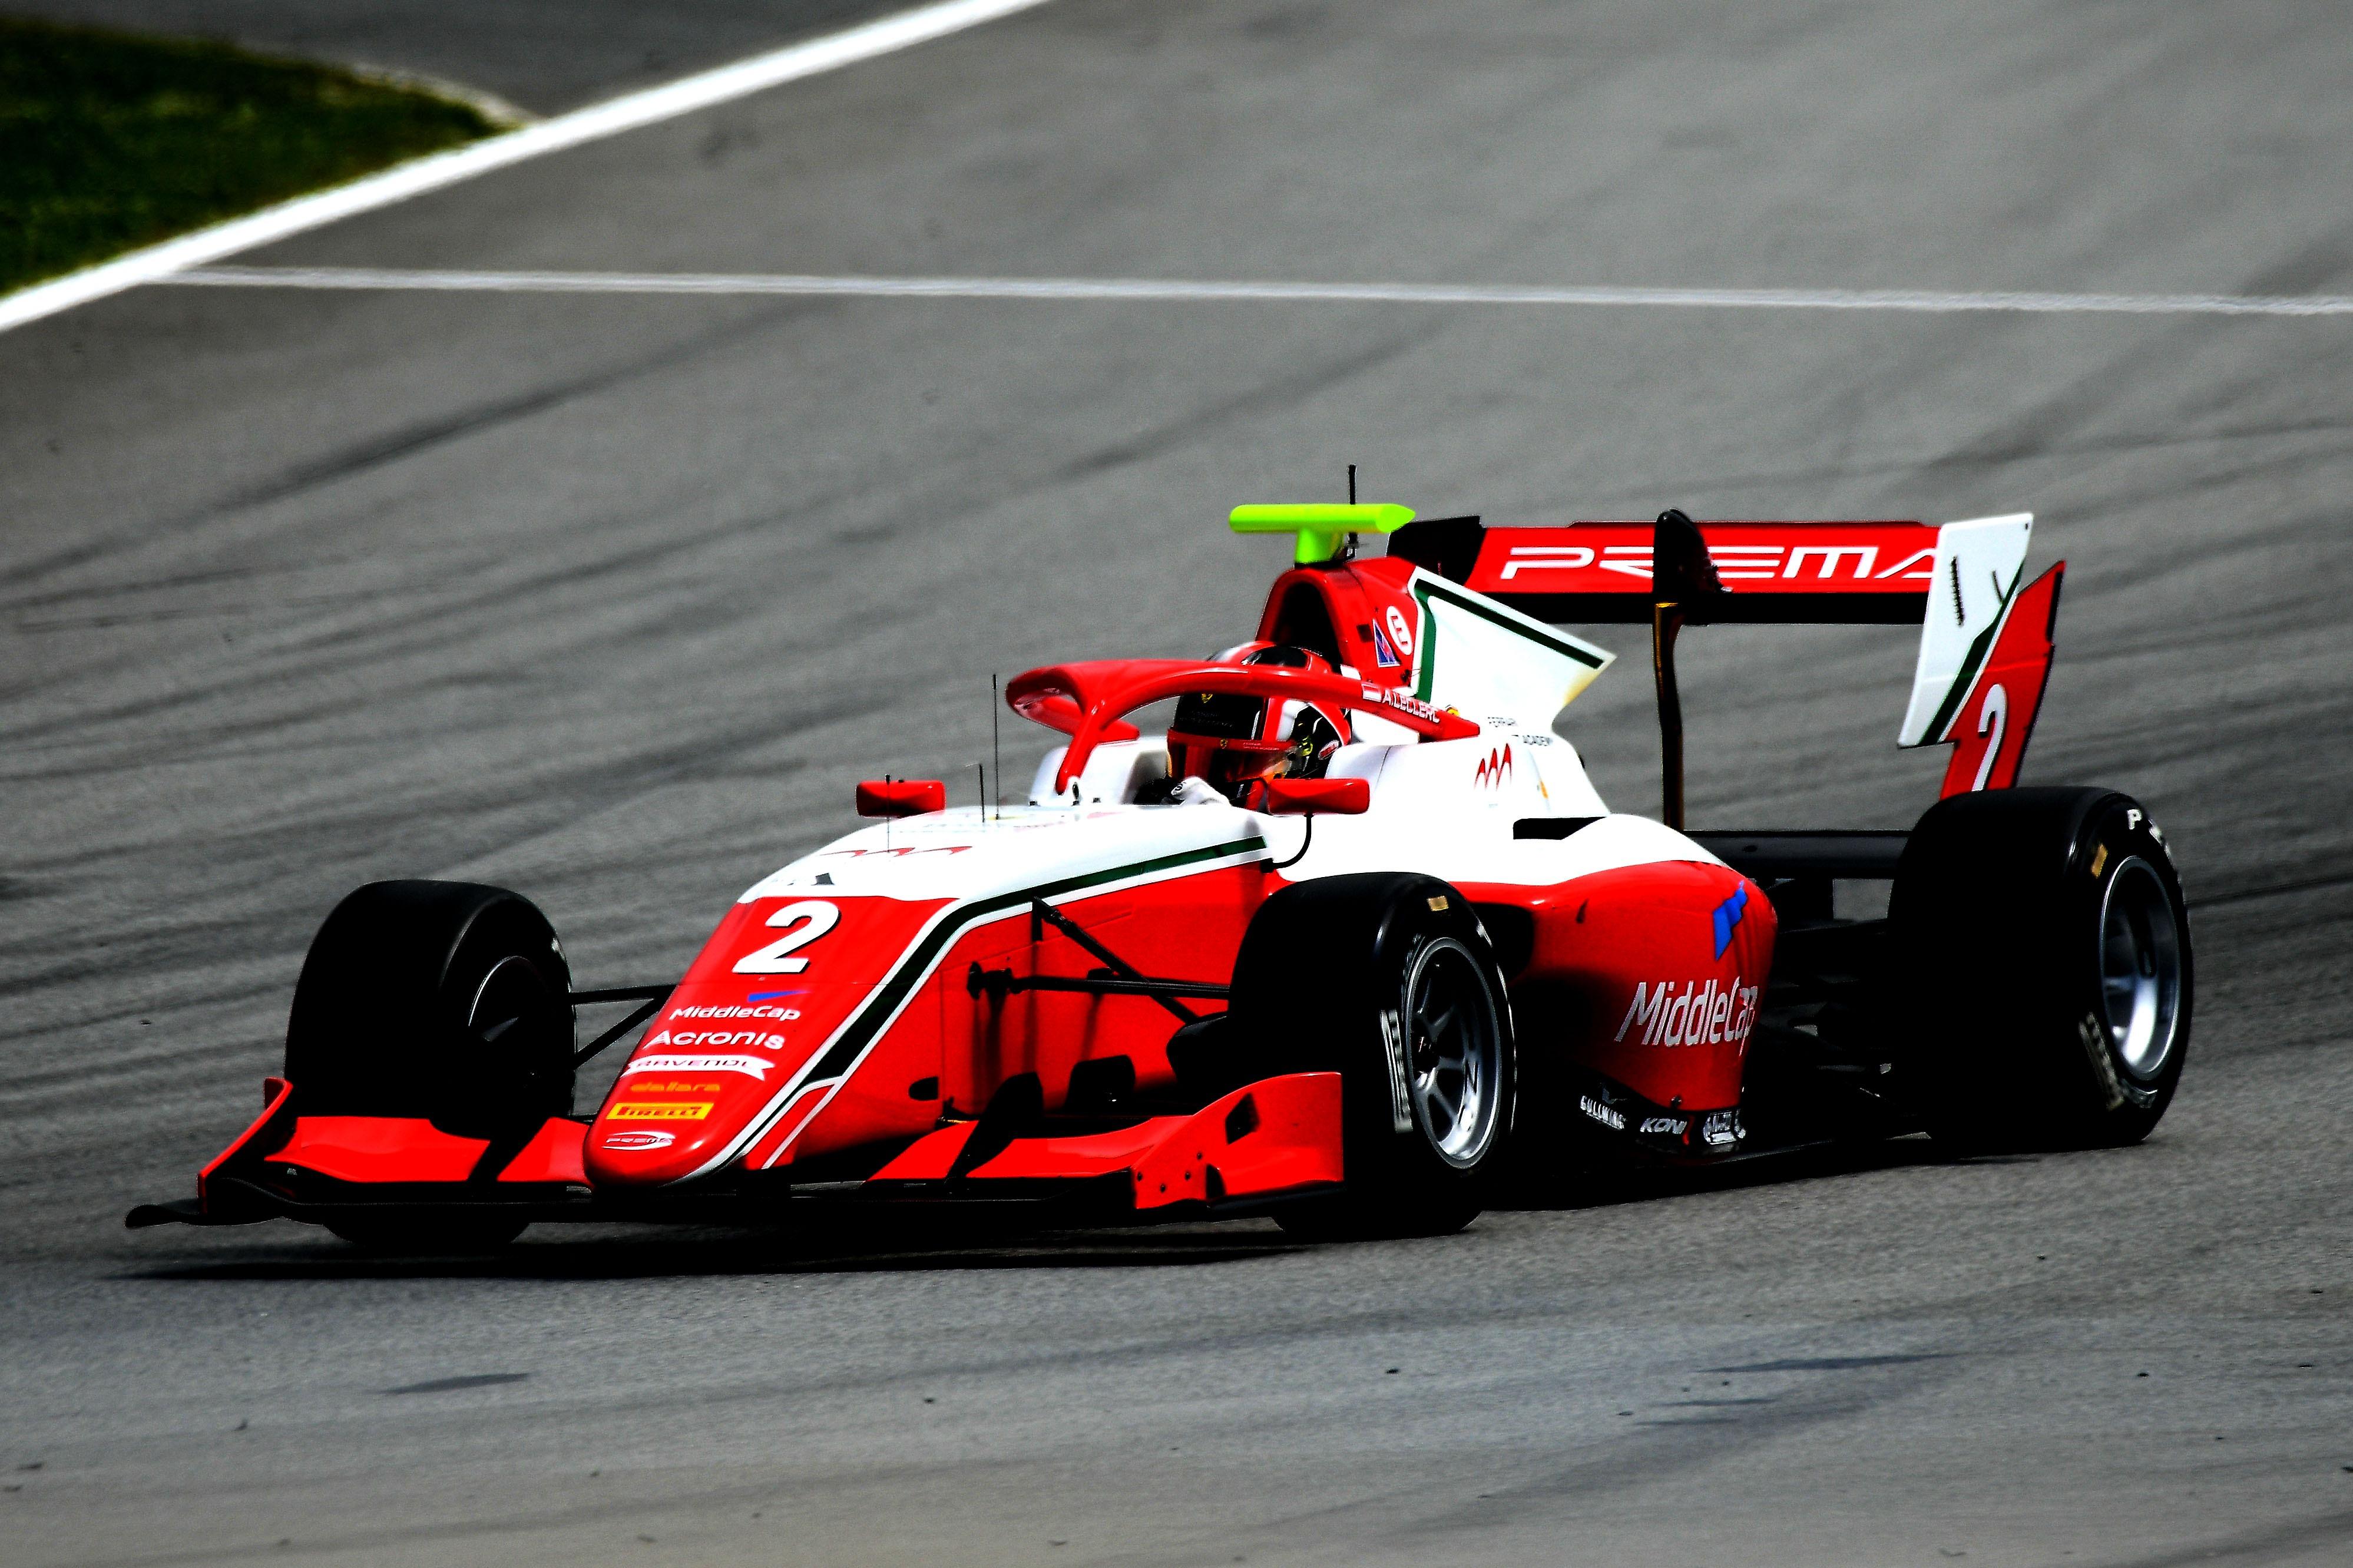 Arthur Leclerc, FIA F3 Barcelona